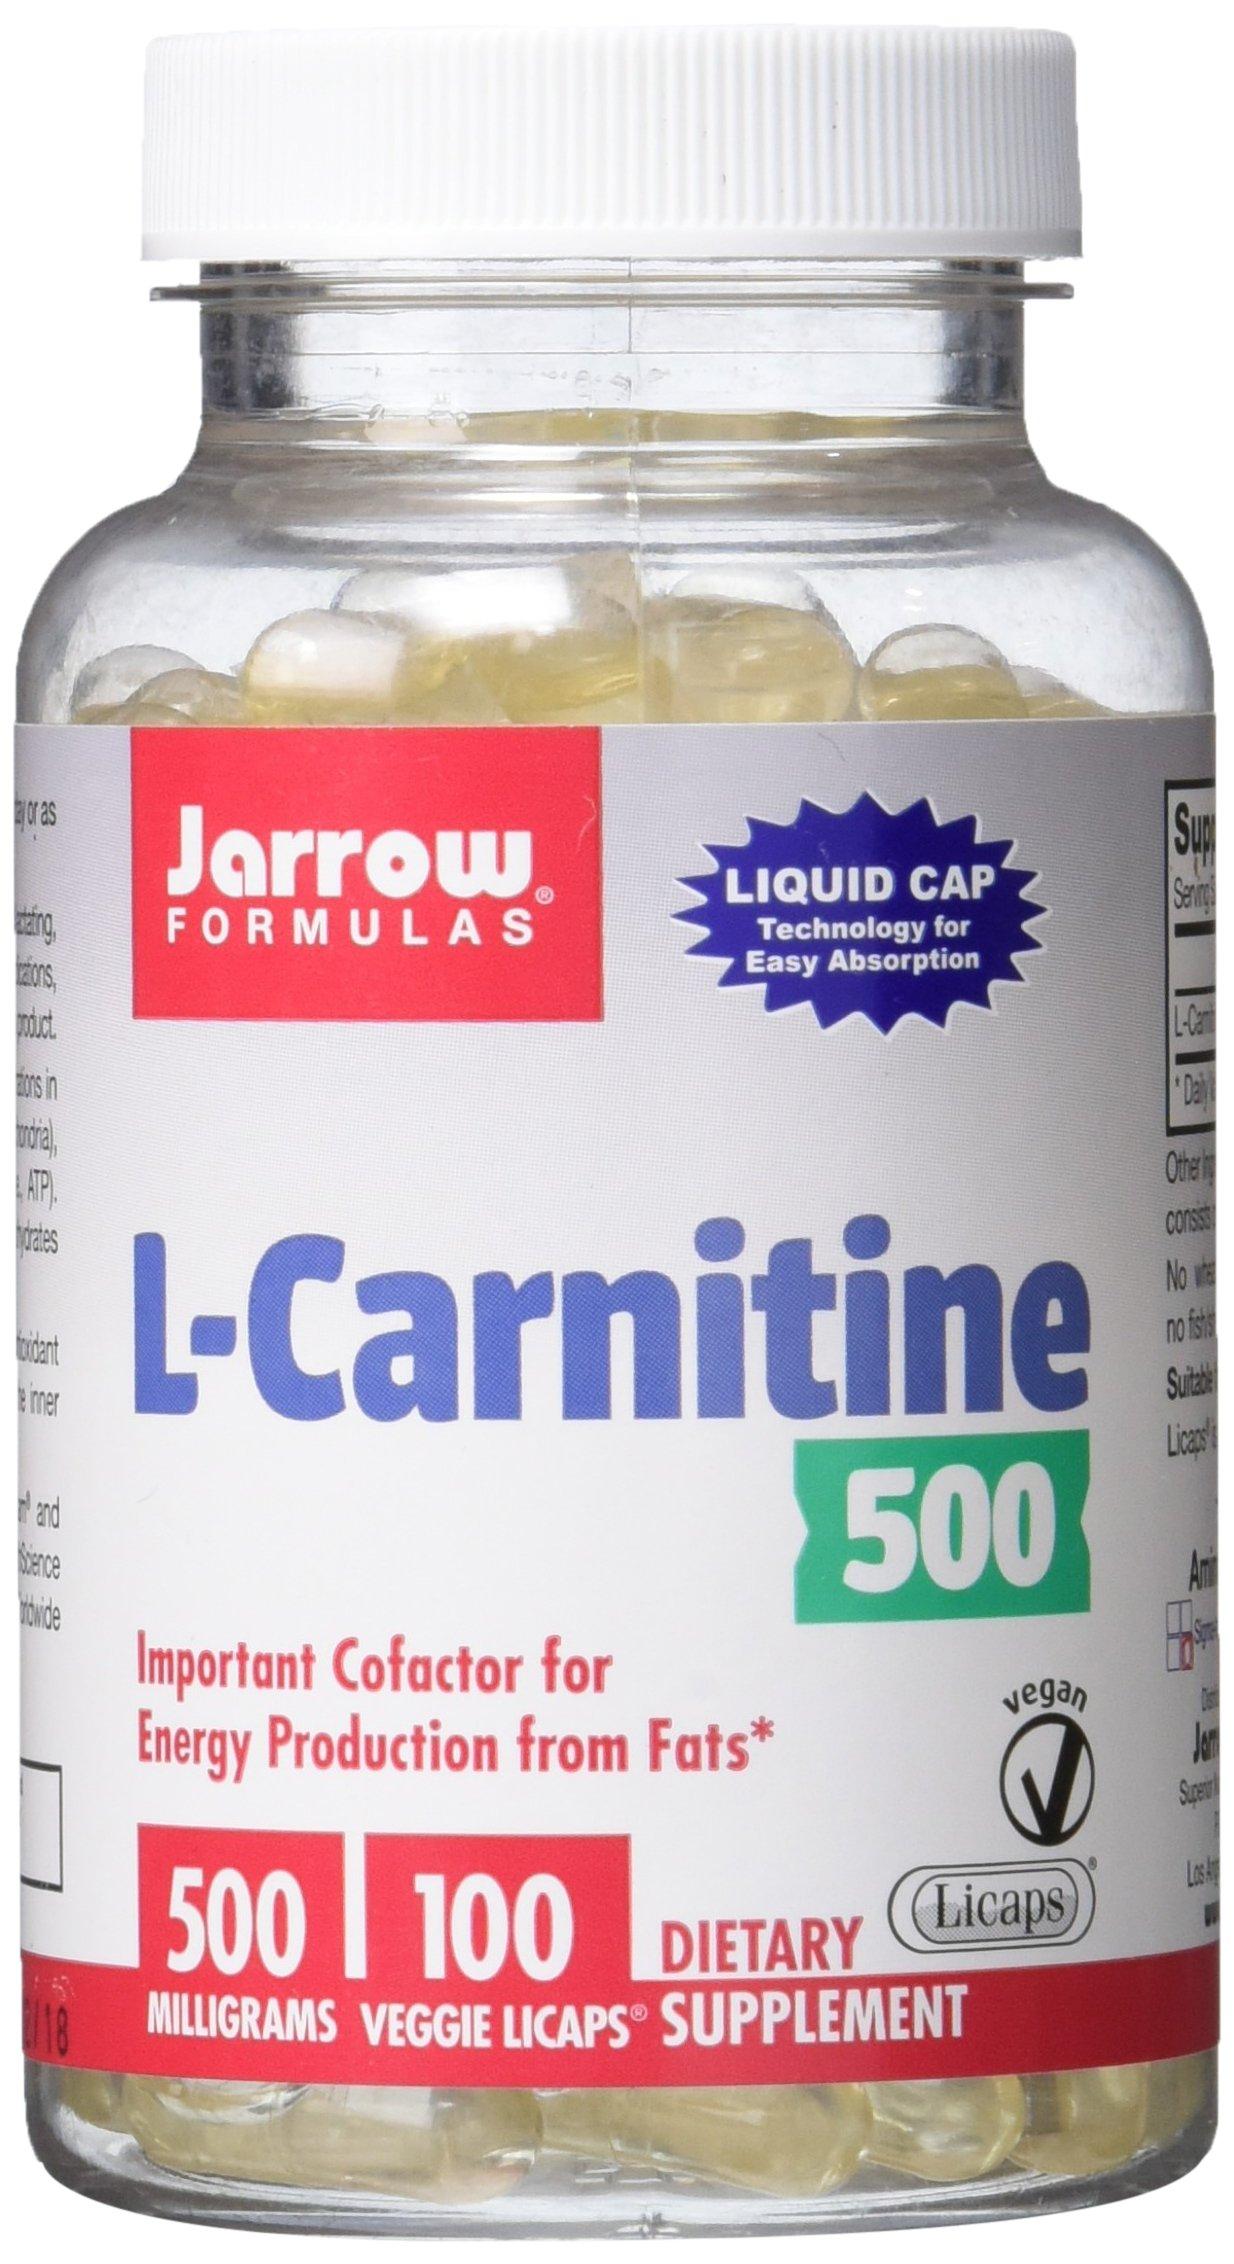 Jarrow Formulas L-Carnitine, Supports Enery, Cardiovascular Health, 500 mg, 100 Veggie Licaps by Jarrow